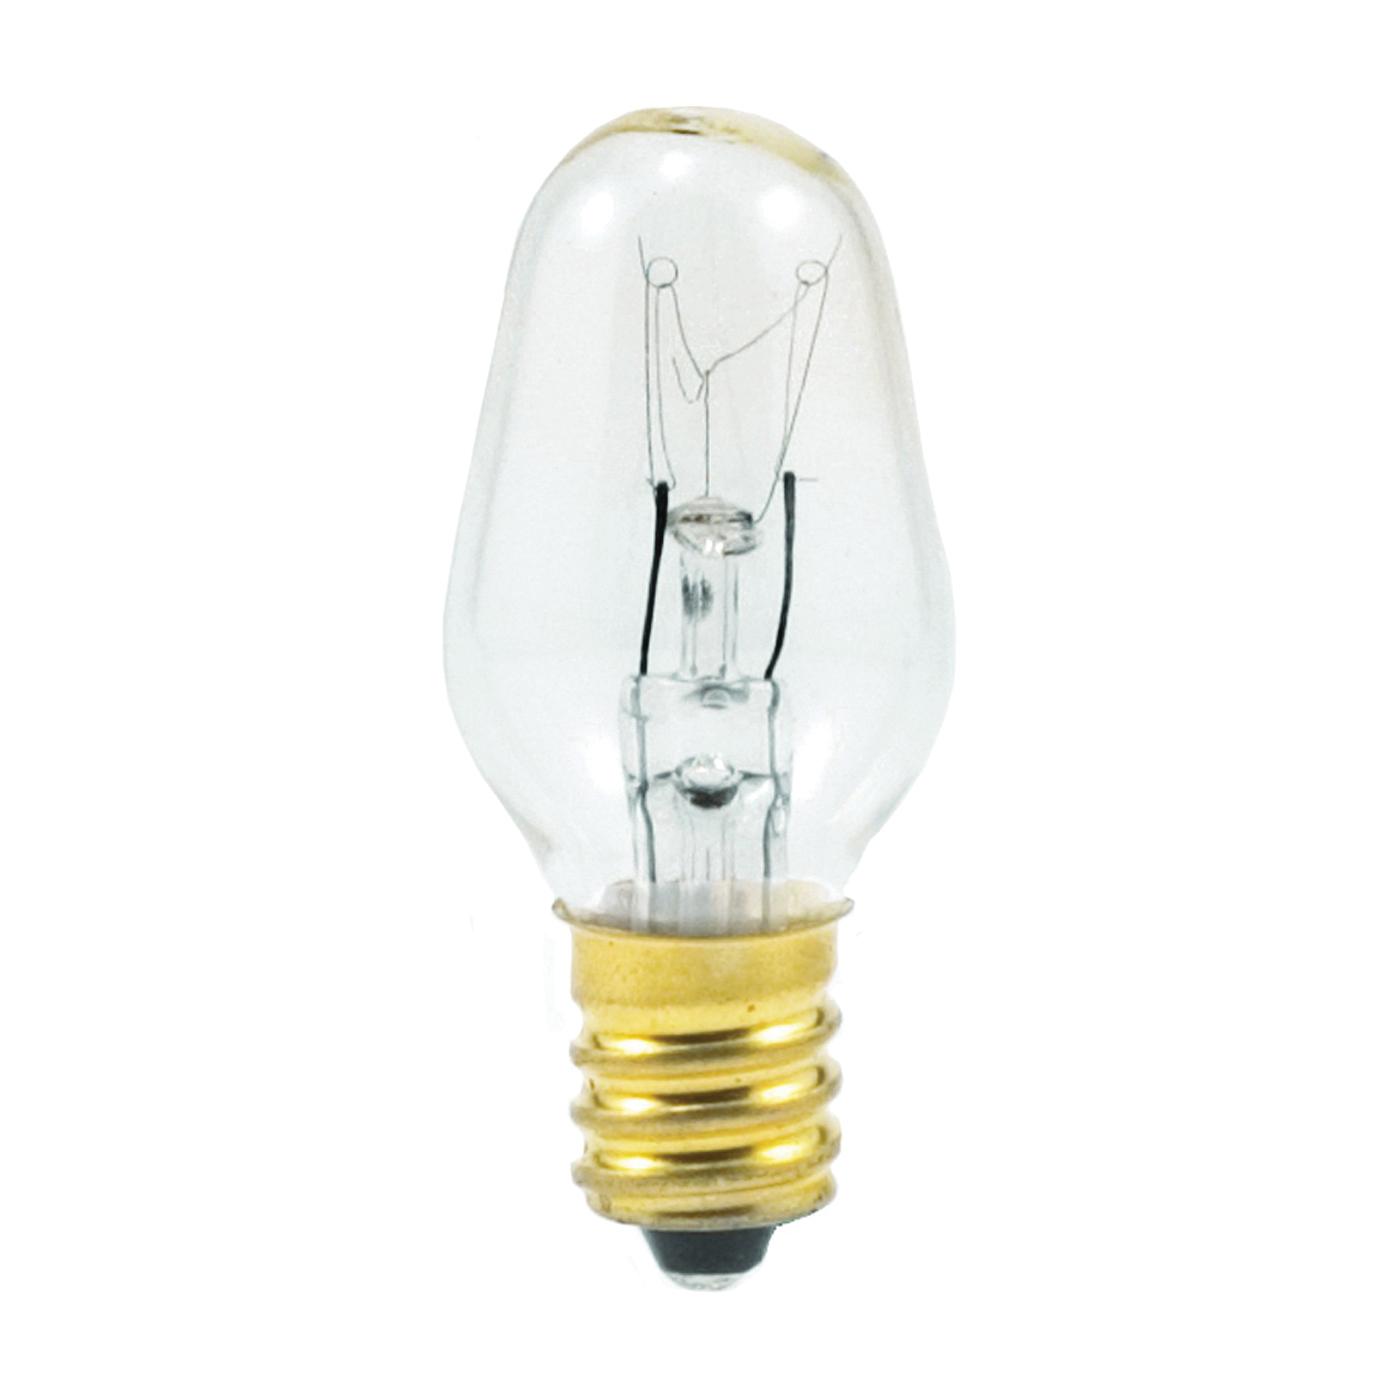 Picture of Sylvania 13543 Incandescent Lamp, 7 W, Candelabra E12 Lamp Base, 2850 K Color Temp, 3000 hr Average Life